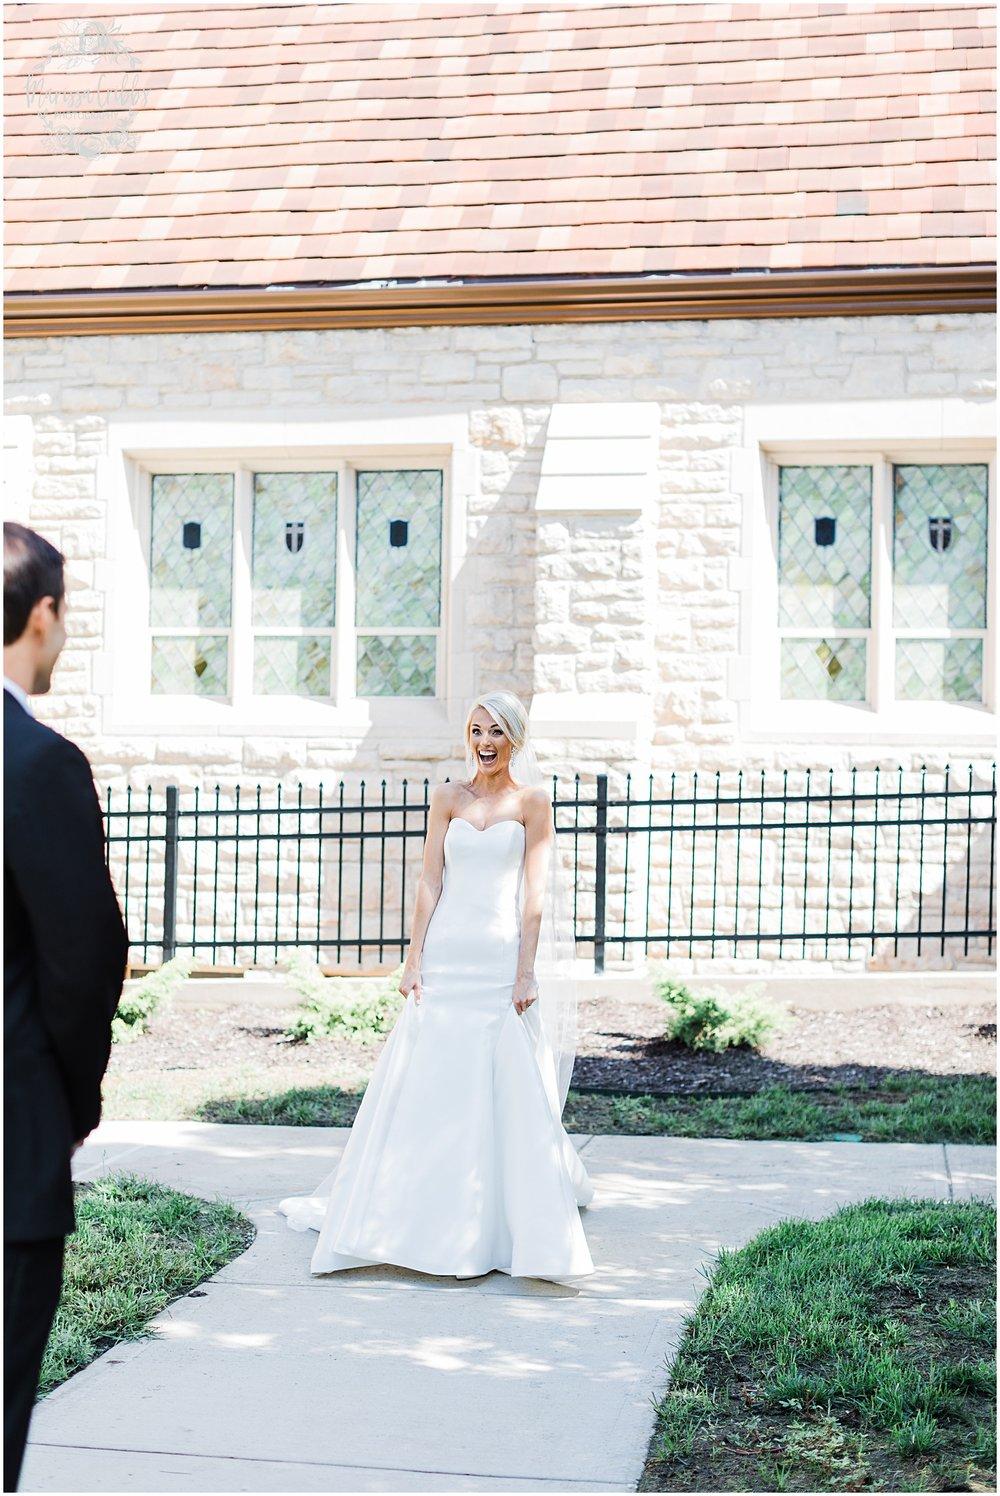 NOLL WEDDING | THE BRASS ON BALTIMORE | MARISSA CRIBBS PHOTOGRAPHY_6276.jpg